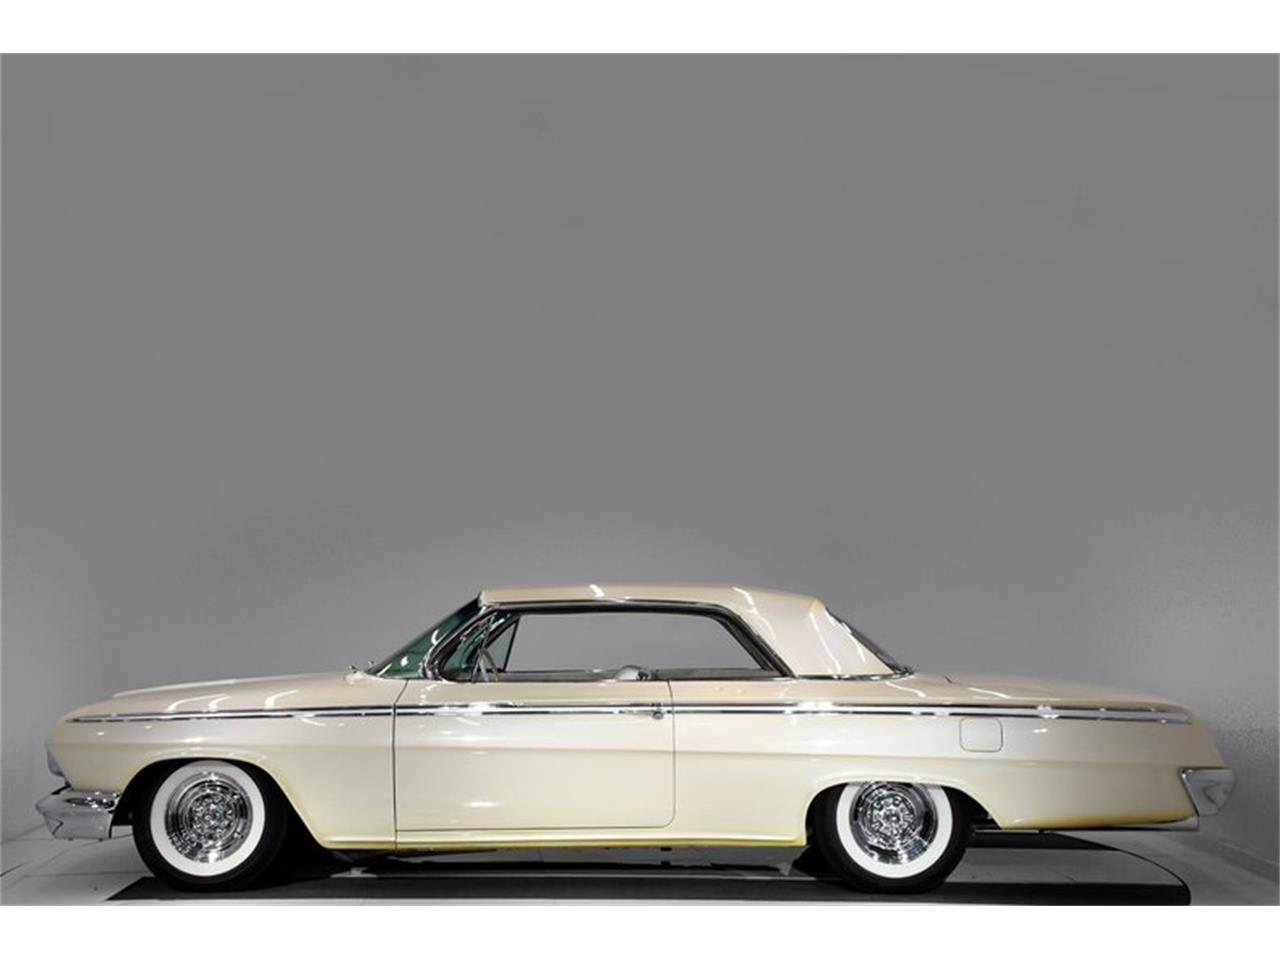 Large Picture of Classic '62 Chevrolet Impala located in Volo Illinois - $51,998.00 - QIVA